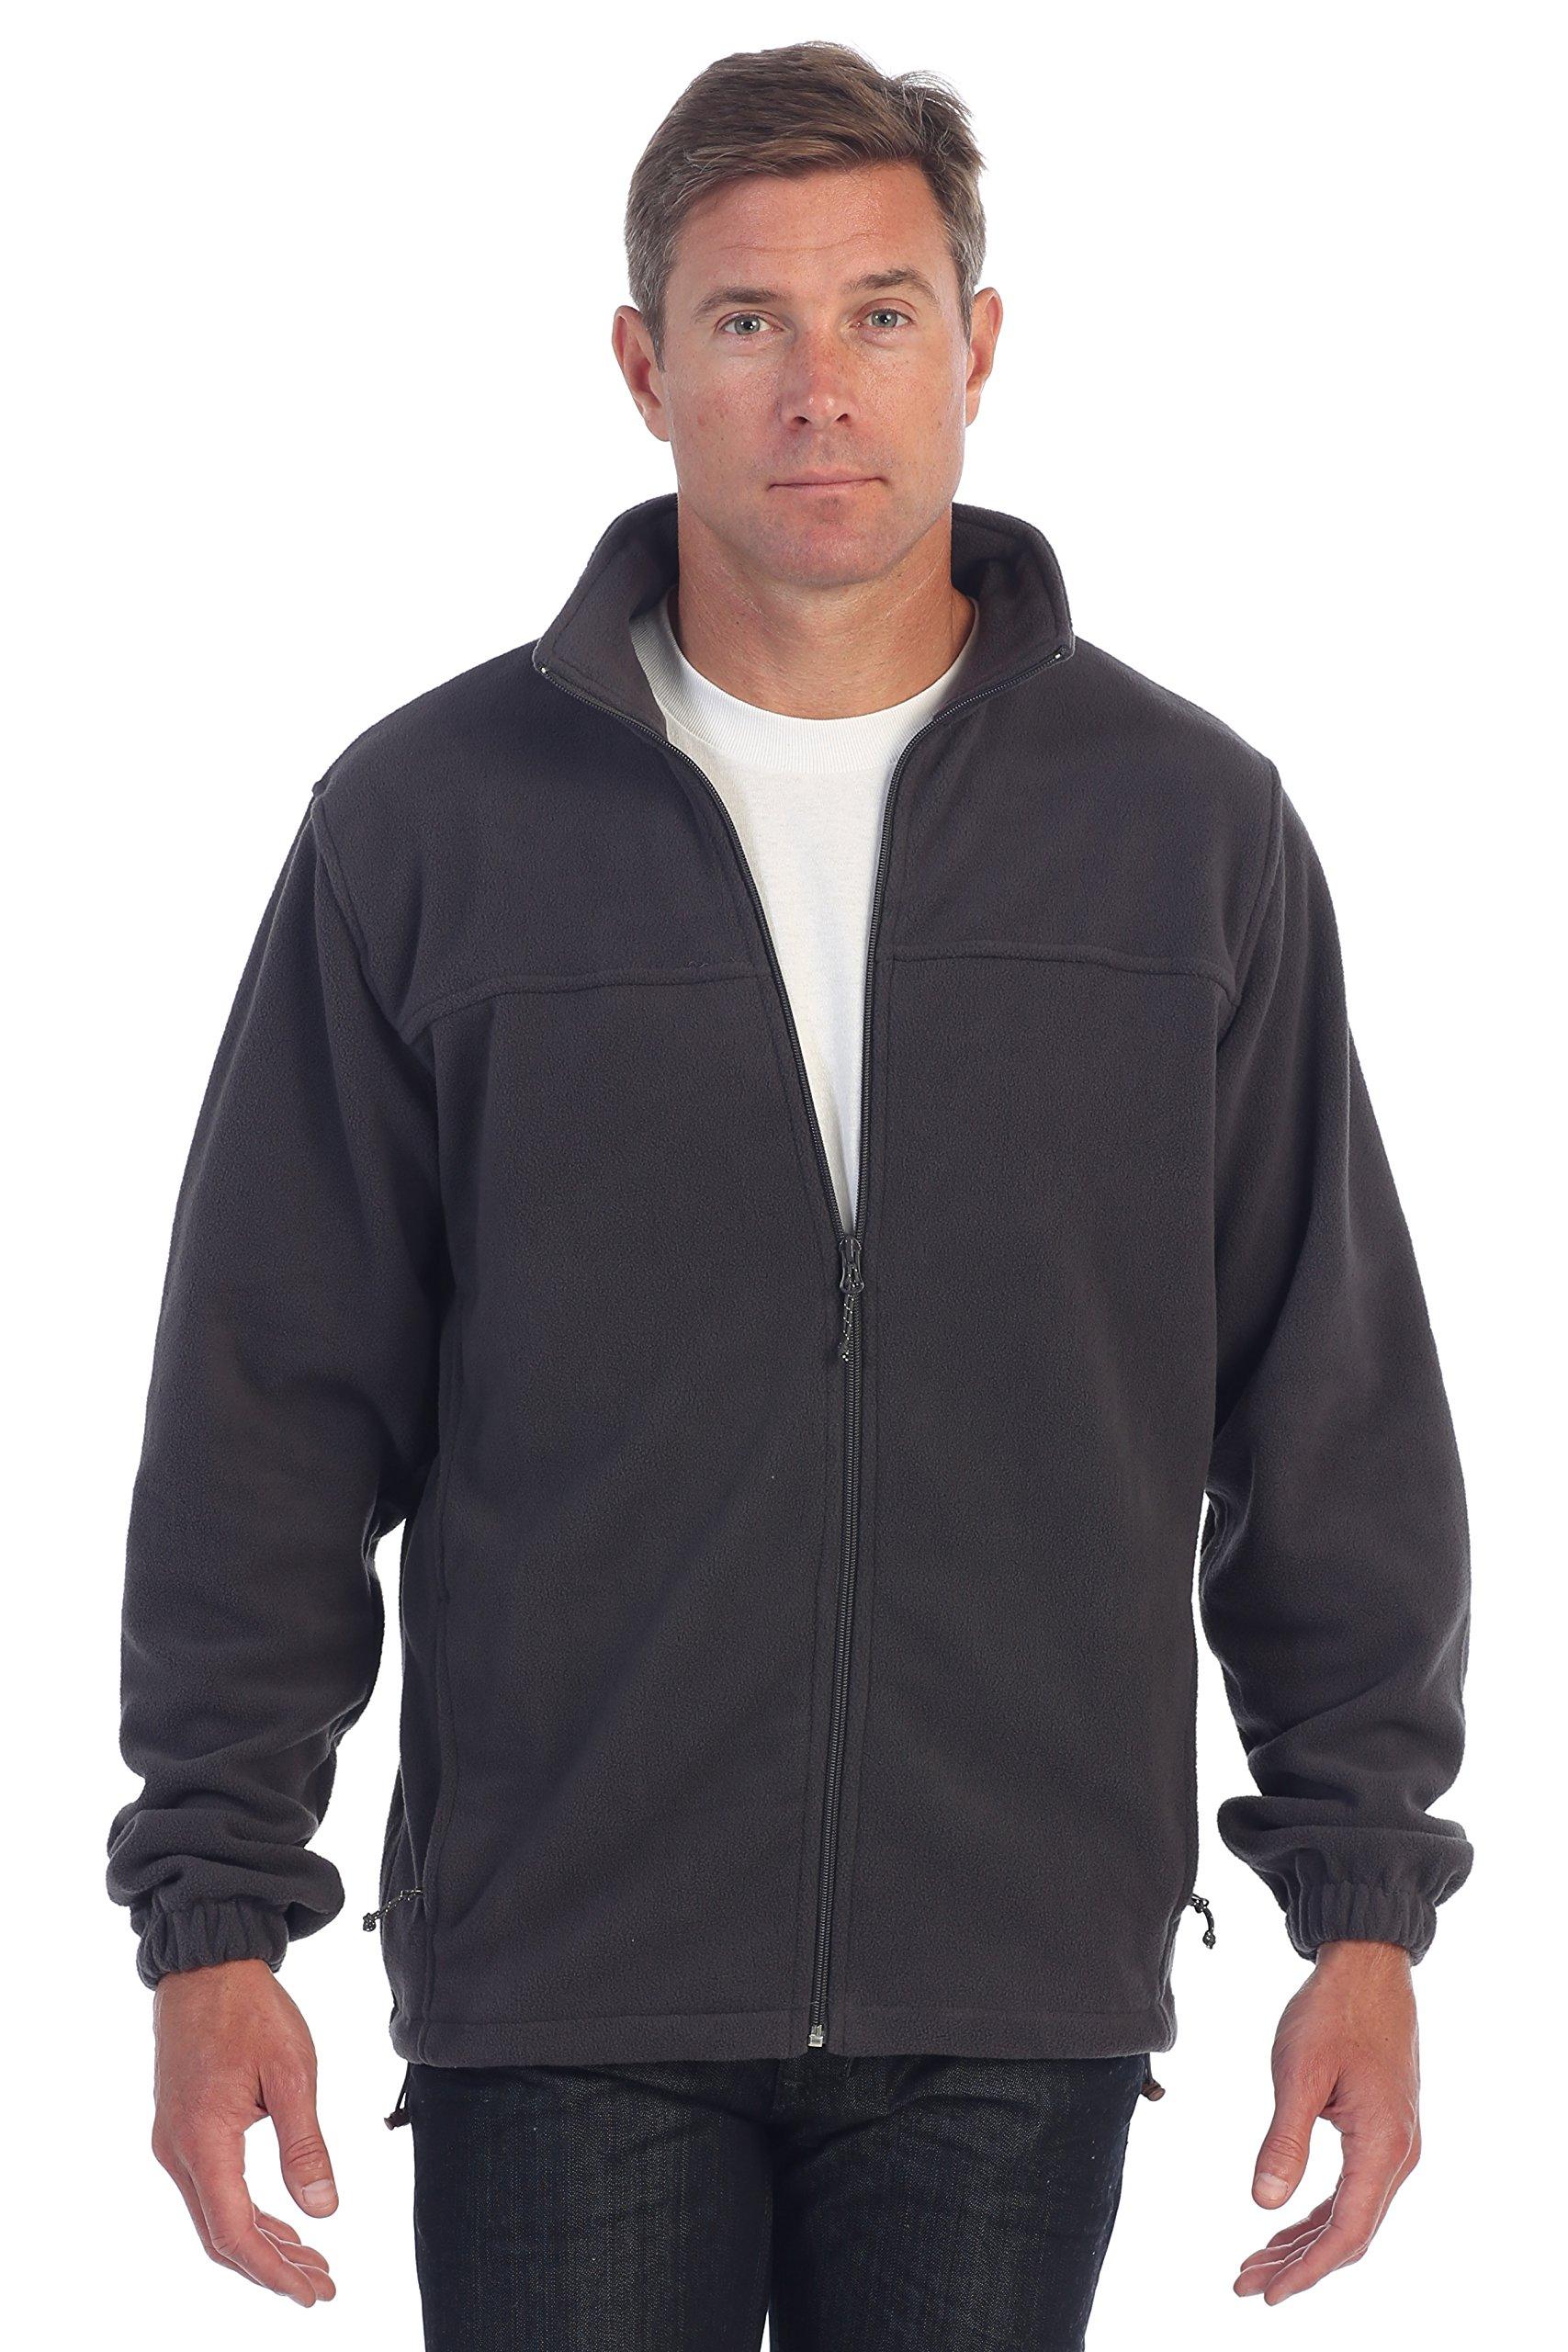 Gioberti Mens Full Zip Polar Fleece Jacket, Heather Charcoal, X-Large by Gioberti